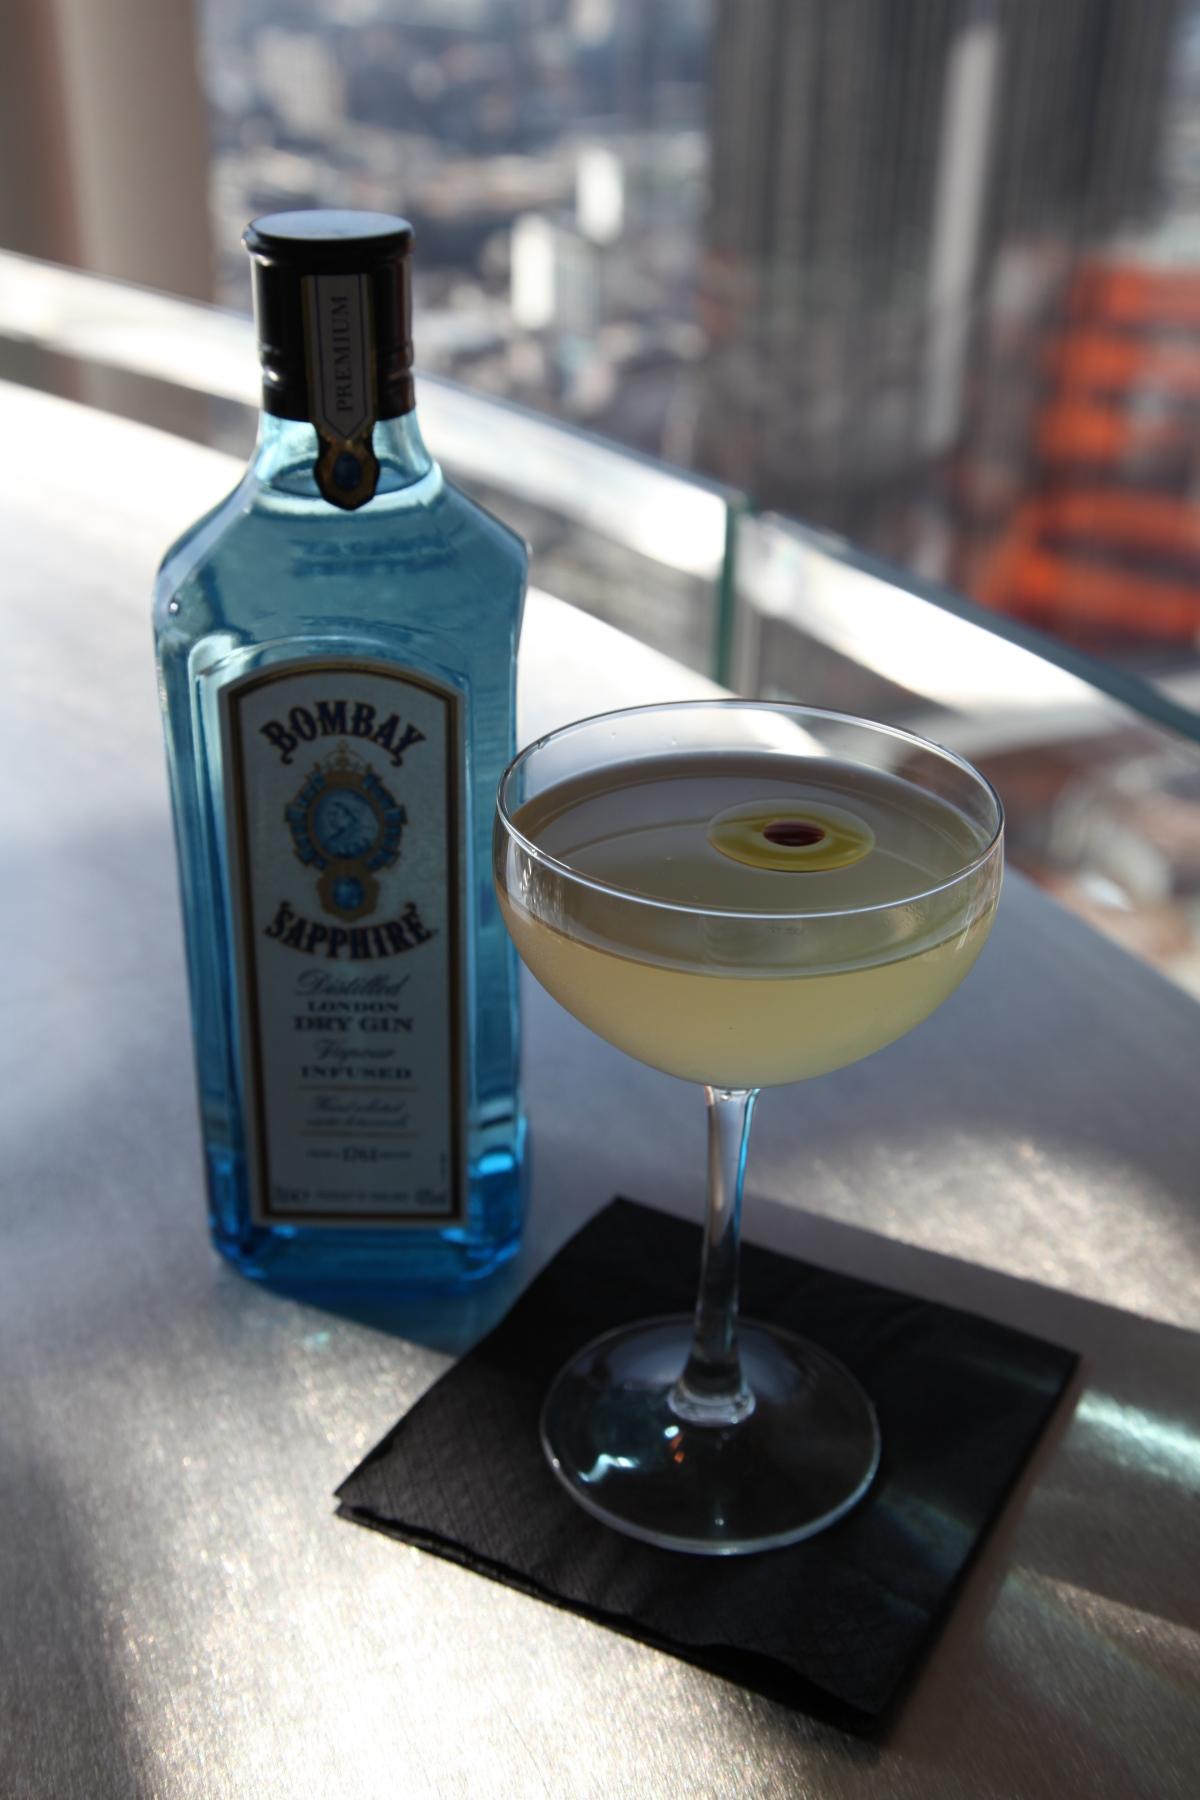 Callooh Callay Imaginarium pop-up Bombay Sapphire cocktail